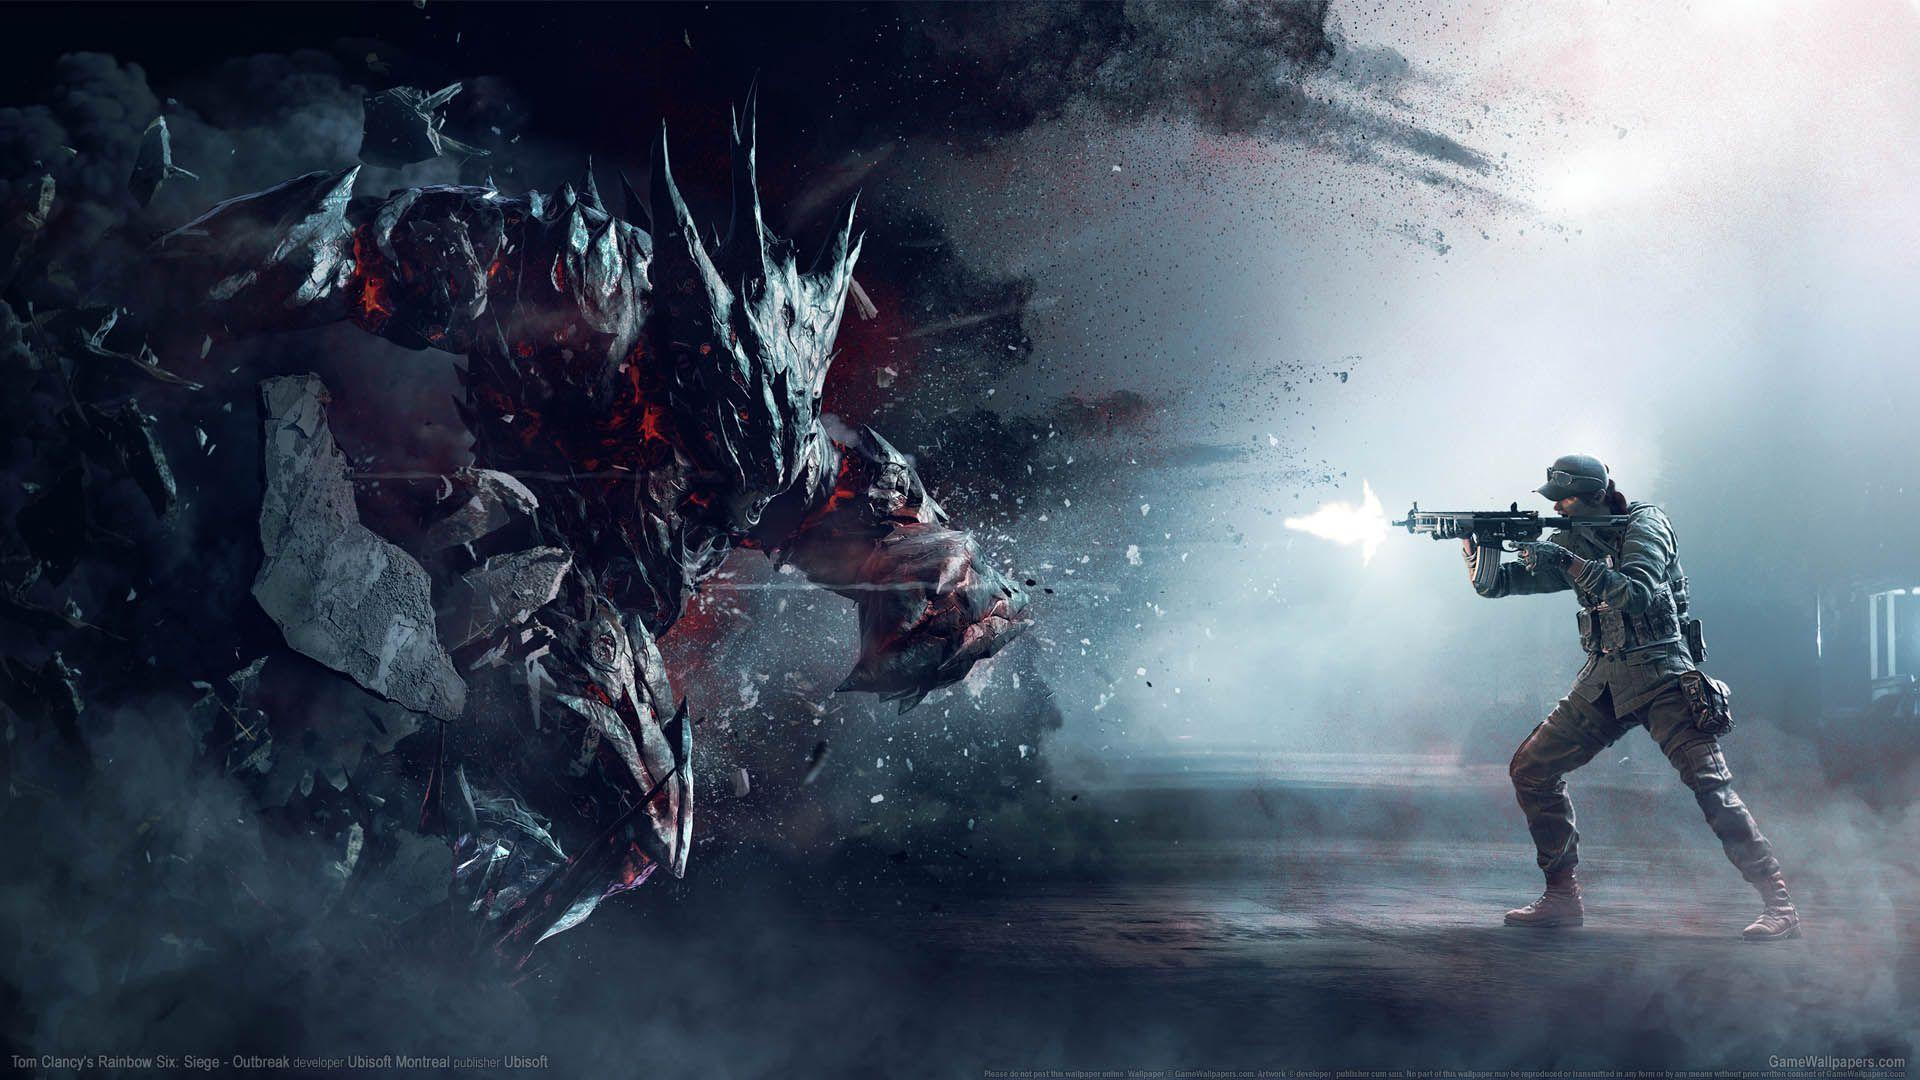 Pin De Gstron En Rainbow Six Siege En 2020 Con Imagenes Gamers